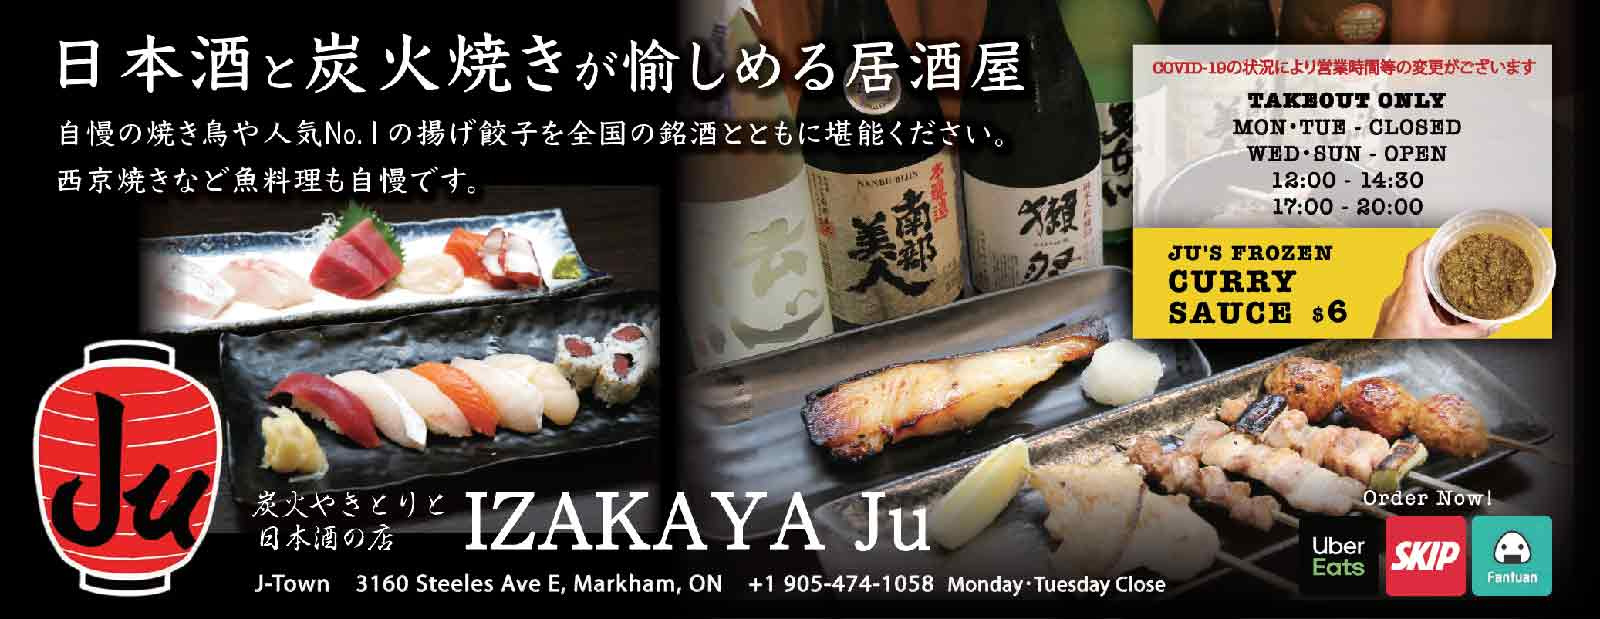 IZAKAYA Ju